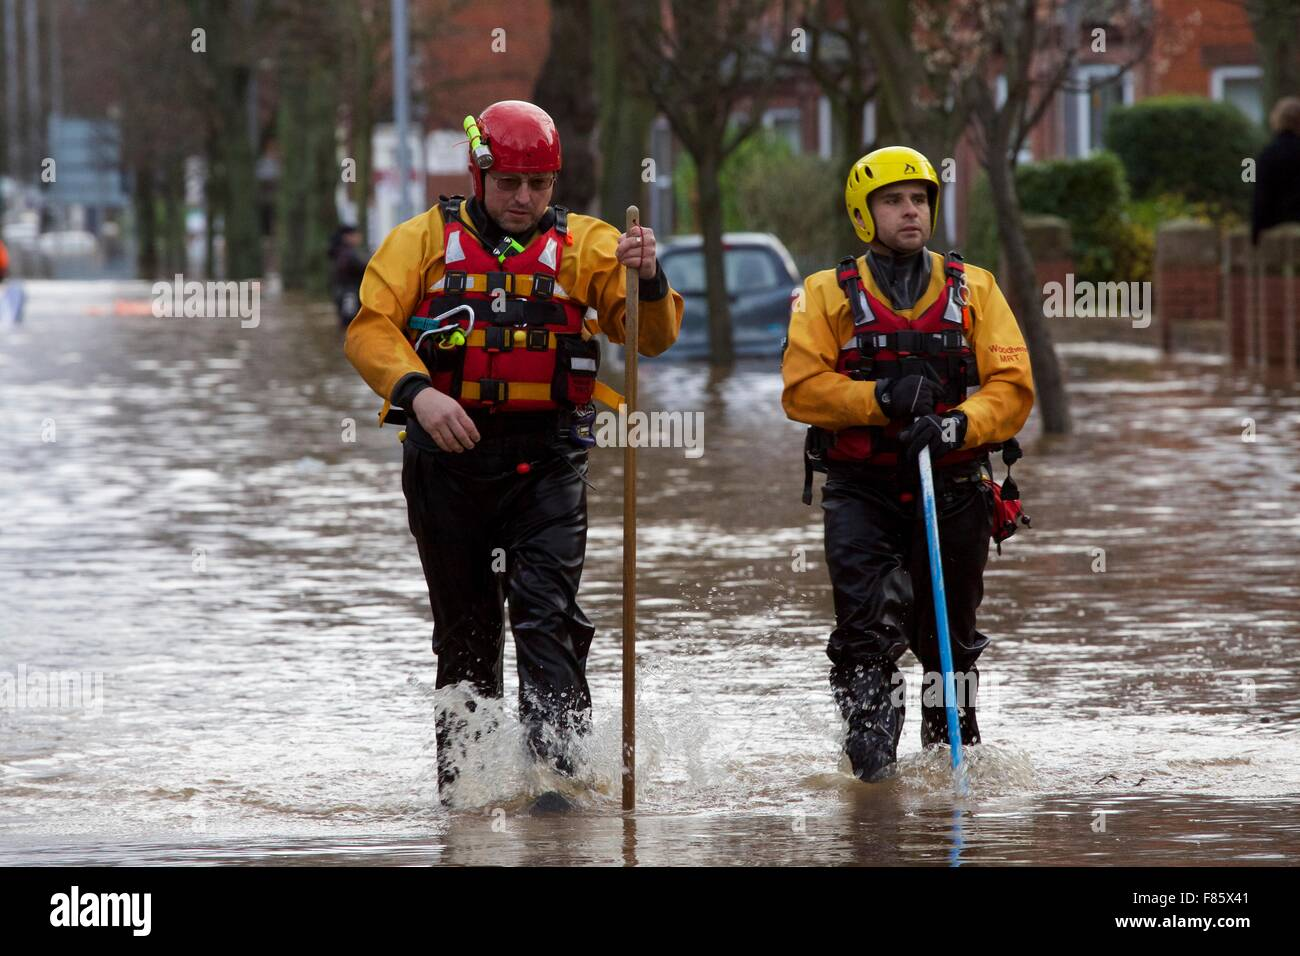 Cumbria Floods. 6th December 2015. RNLI rescue team volunteer wading through Carlisle city centre. Storm Desmond - Stock Image